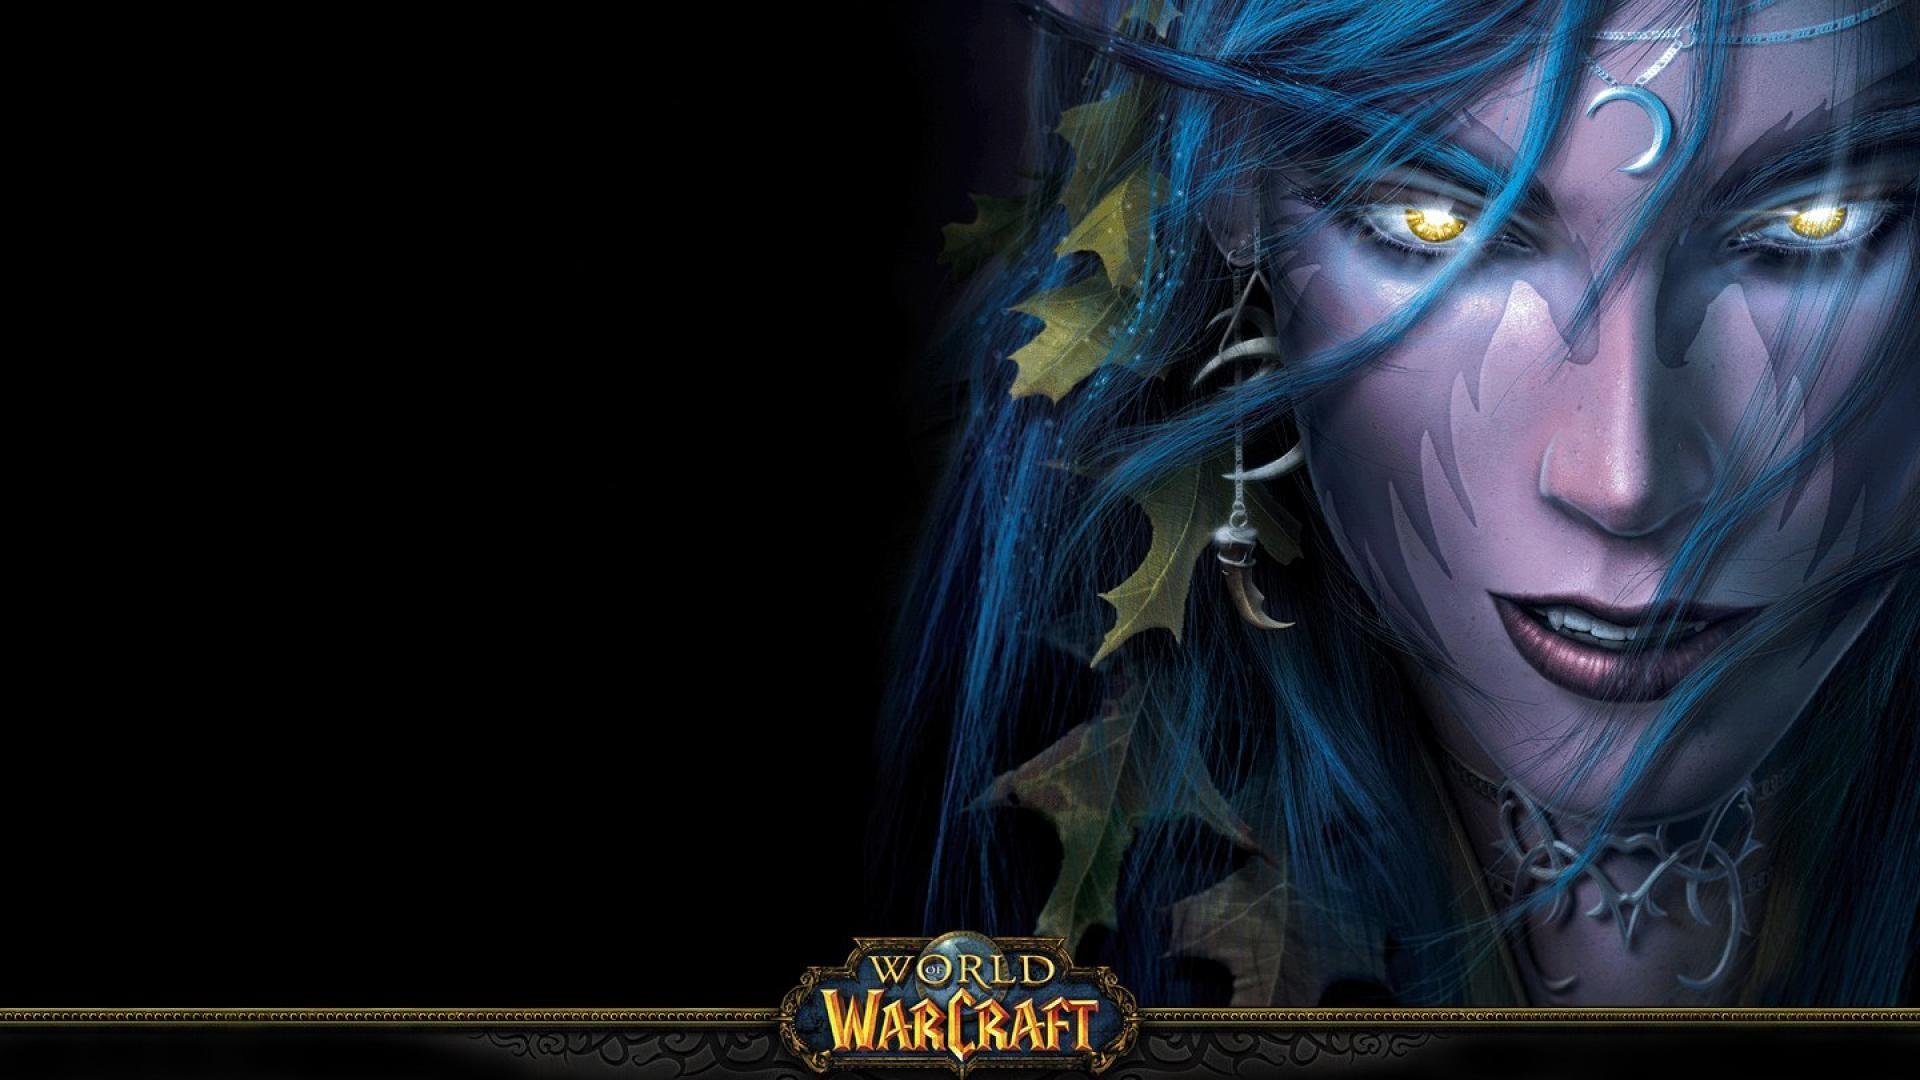 World of warcraft night elf Wallpaper · Death KnightNight …